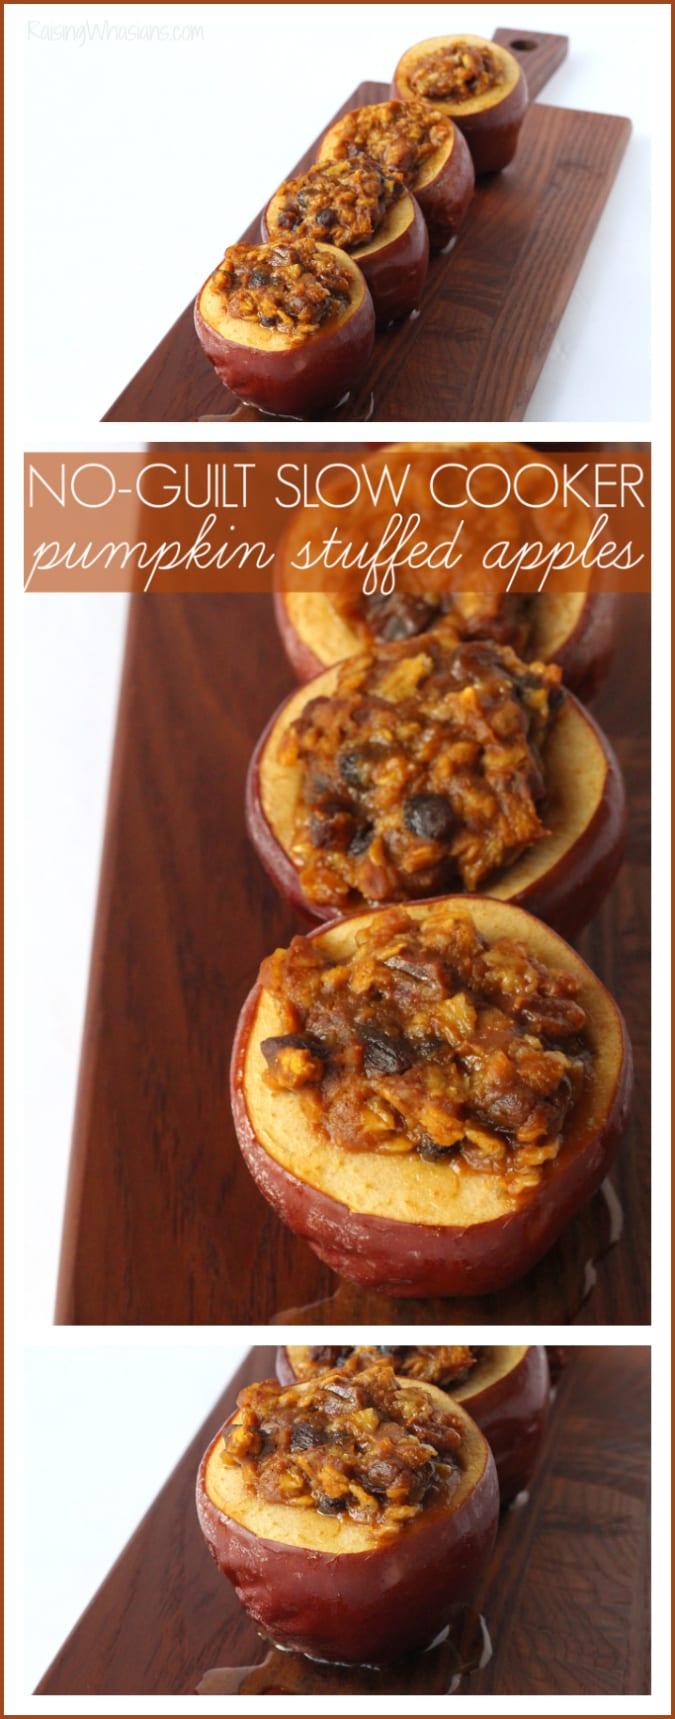 Healthy slow cooker pumpkin stuffed apples